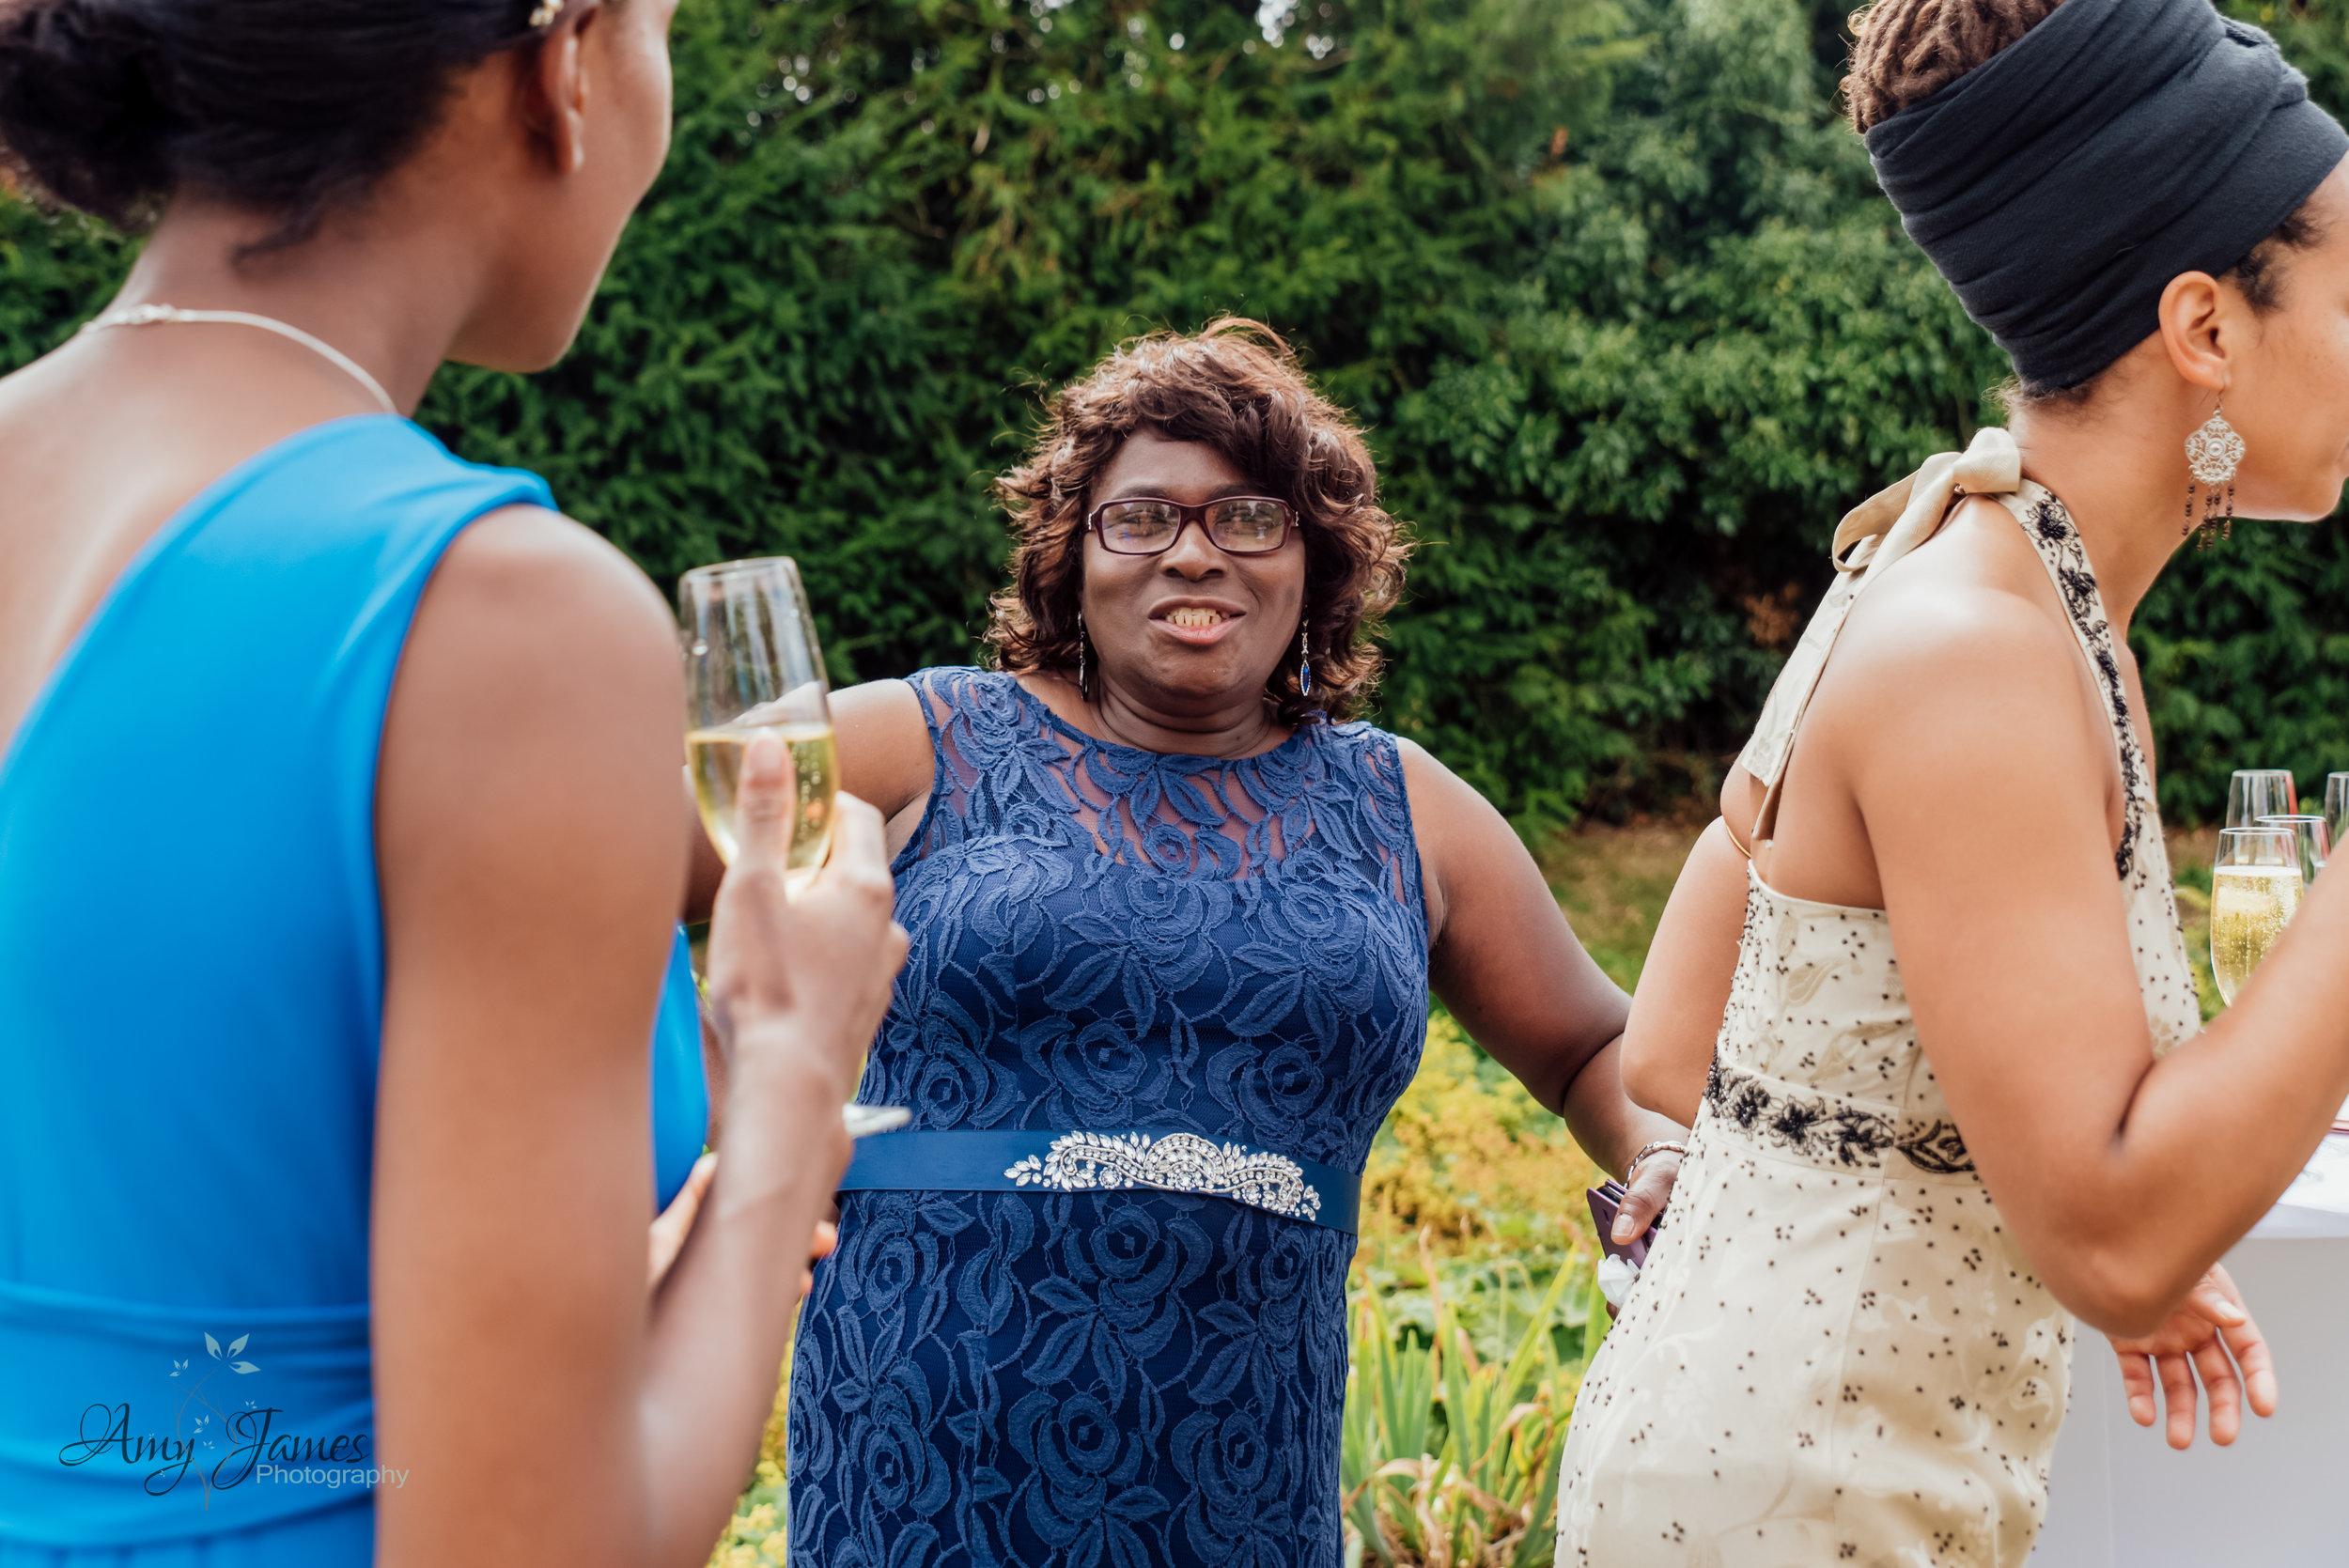 documentary wedding photographer for The Four Season hotel Hampshire - Amy James Photography Wedding Photographer for Hampshire and Surrey